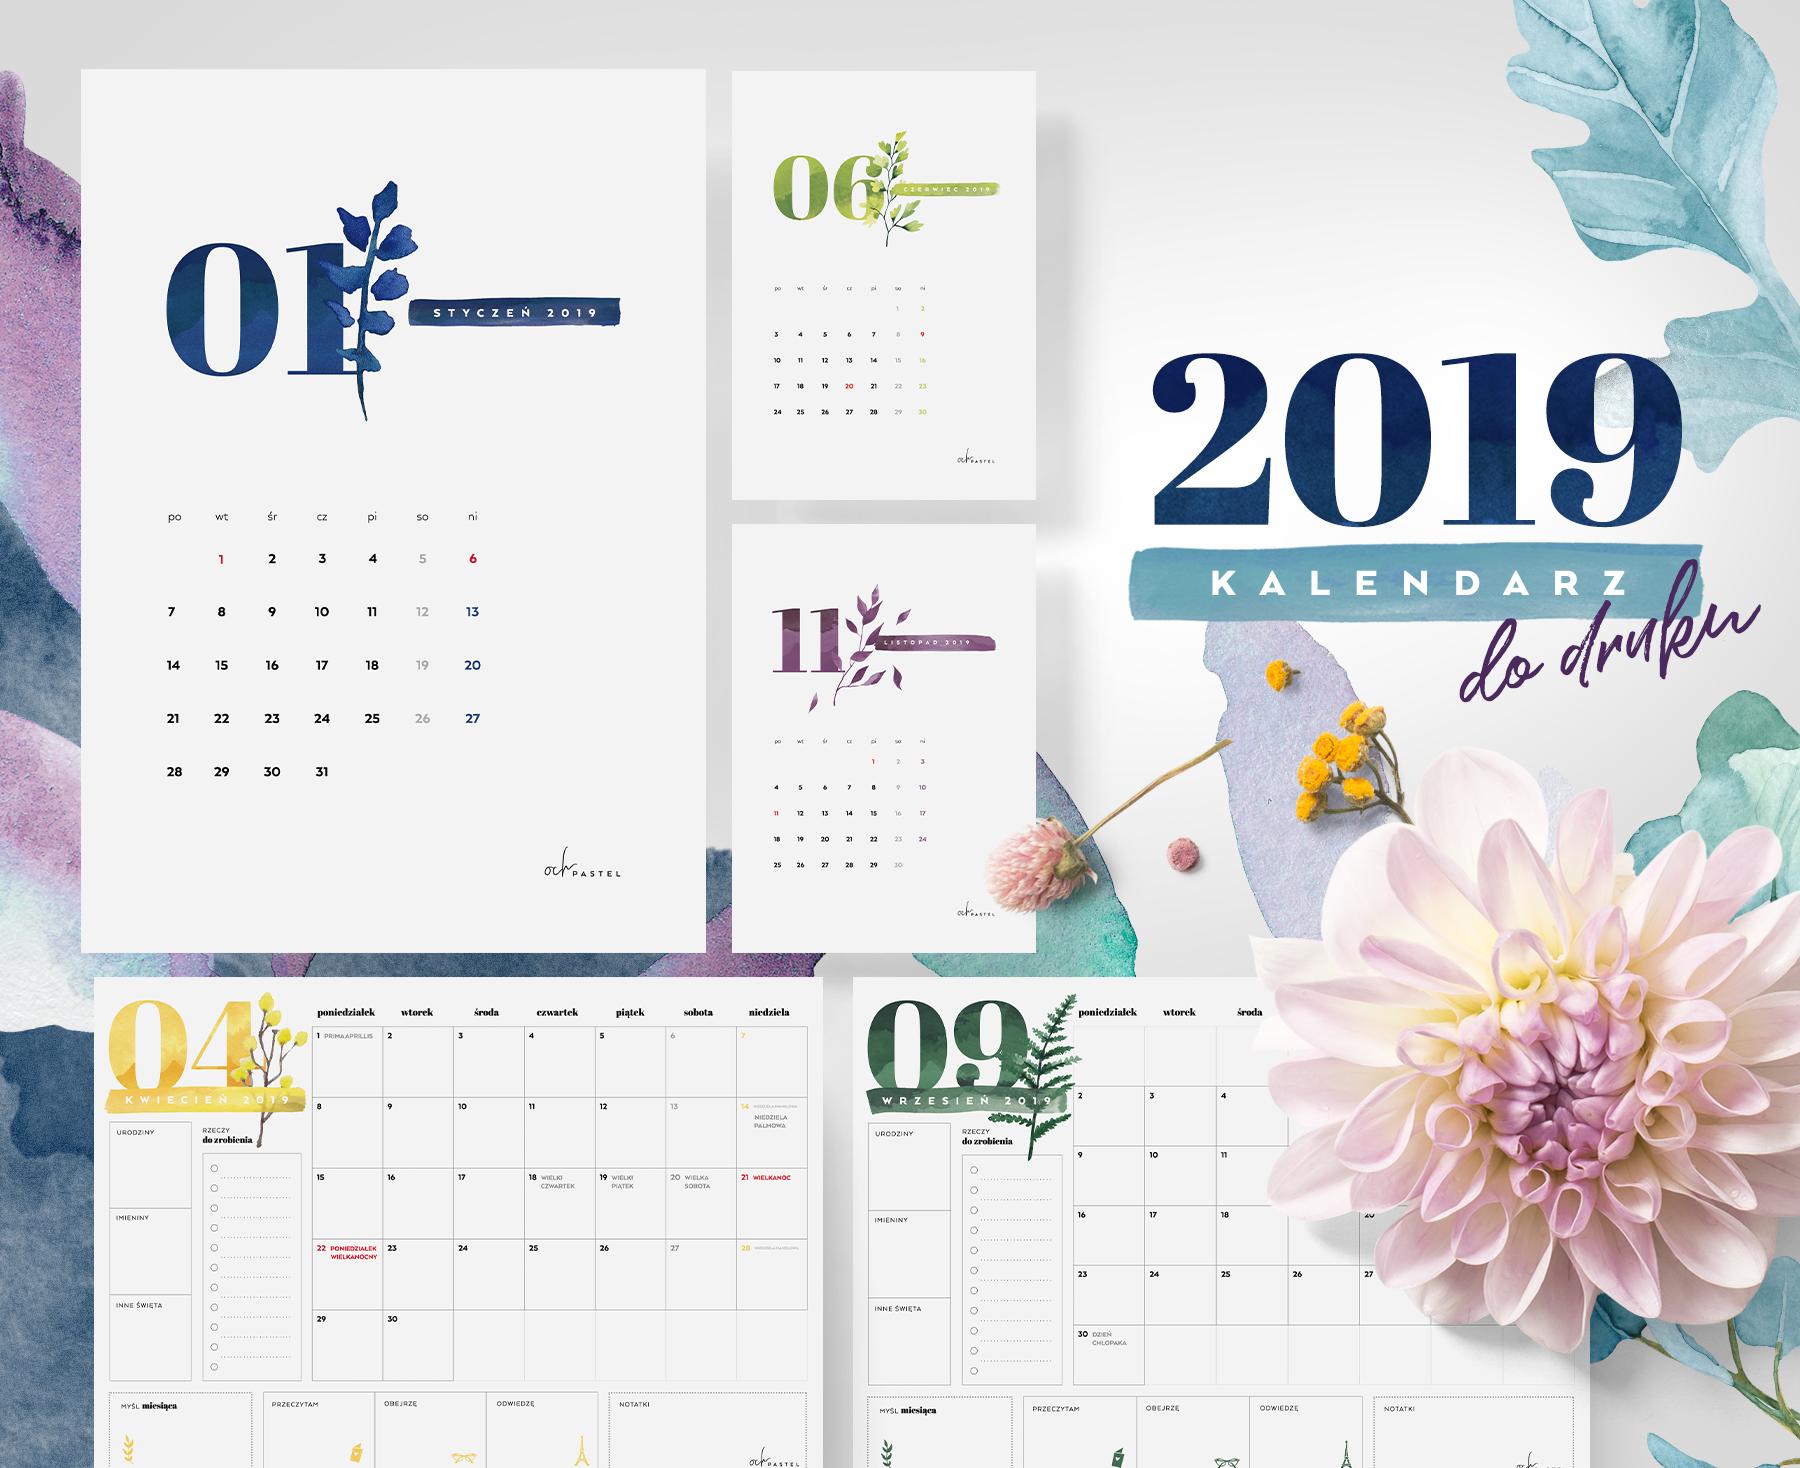 Kalendarz 2019 Do Druku My Pink Plum